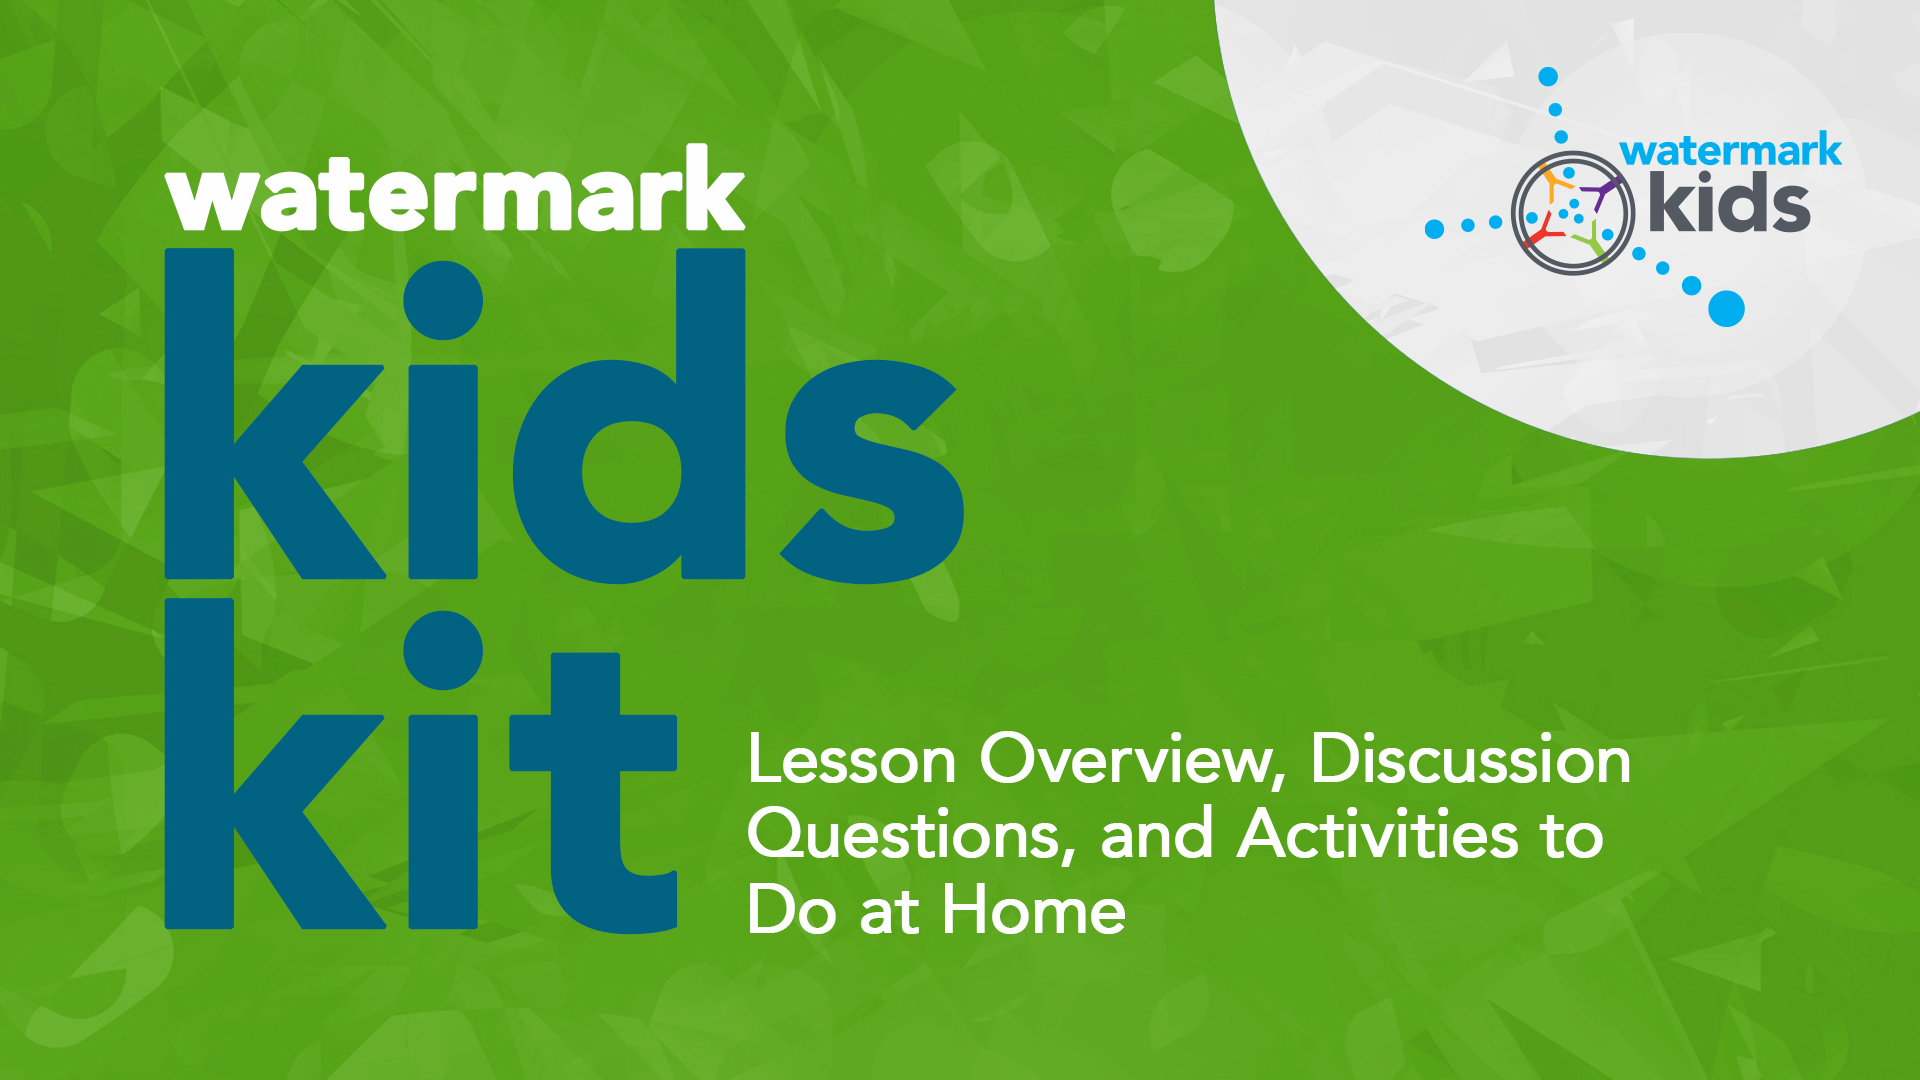 Watermark Kids Kit for April 19 Hero Image